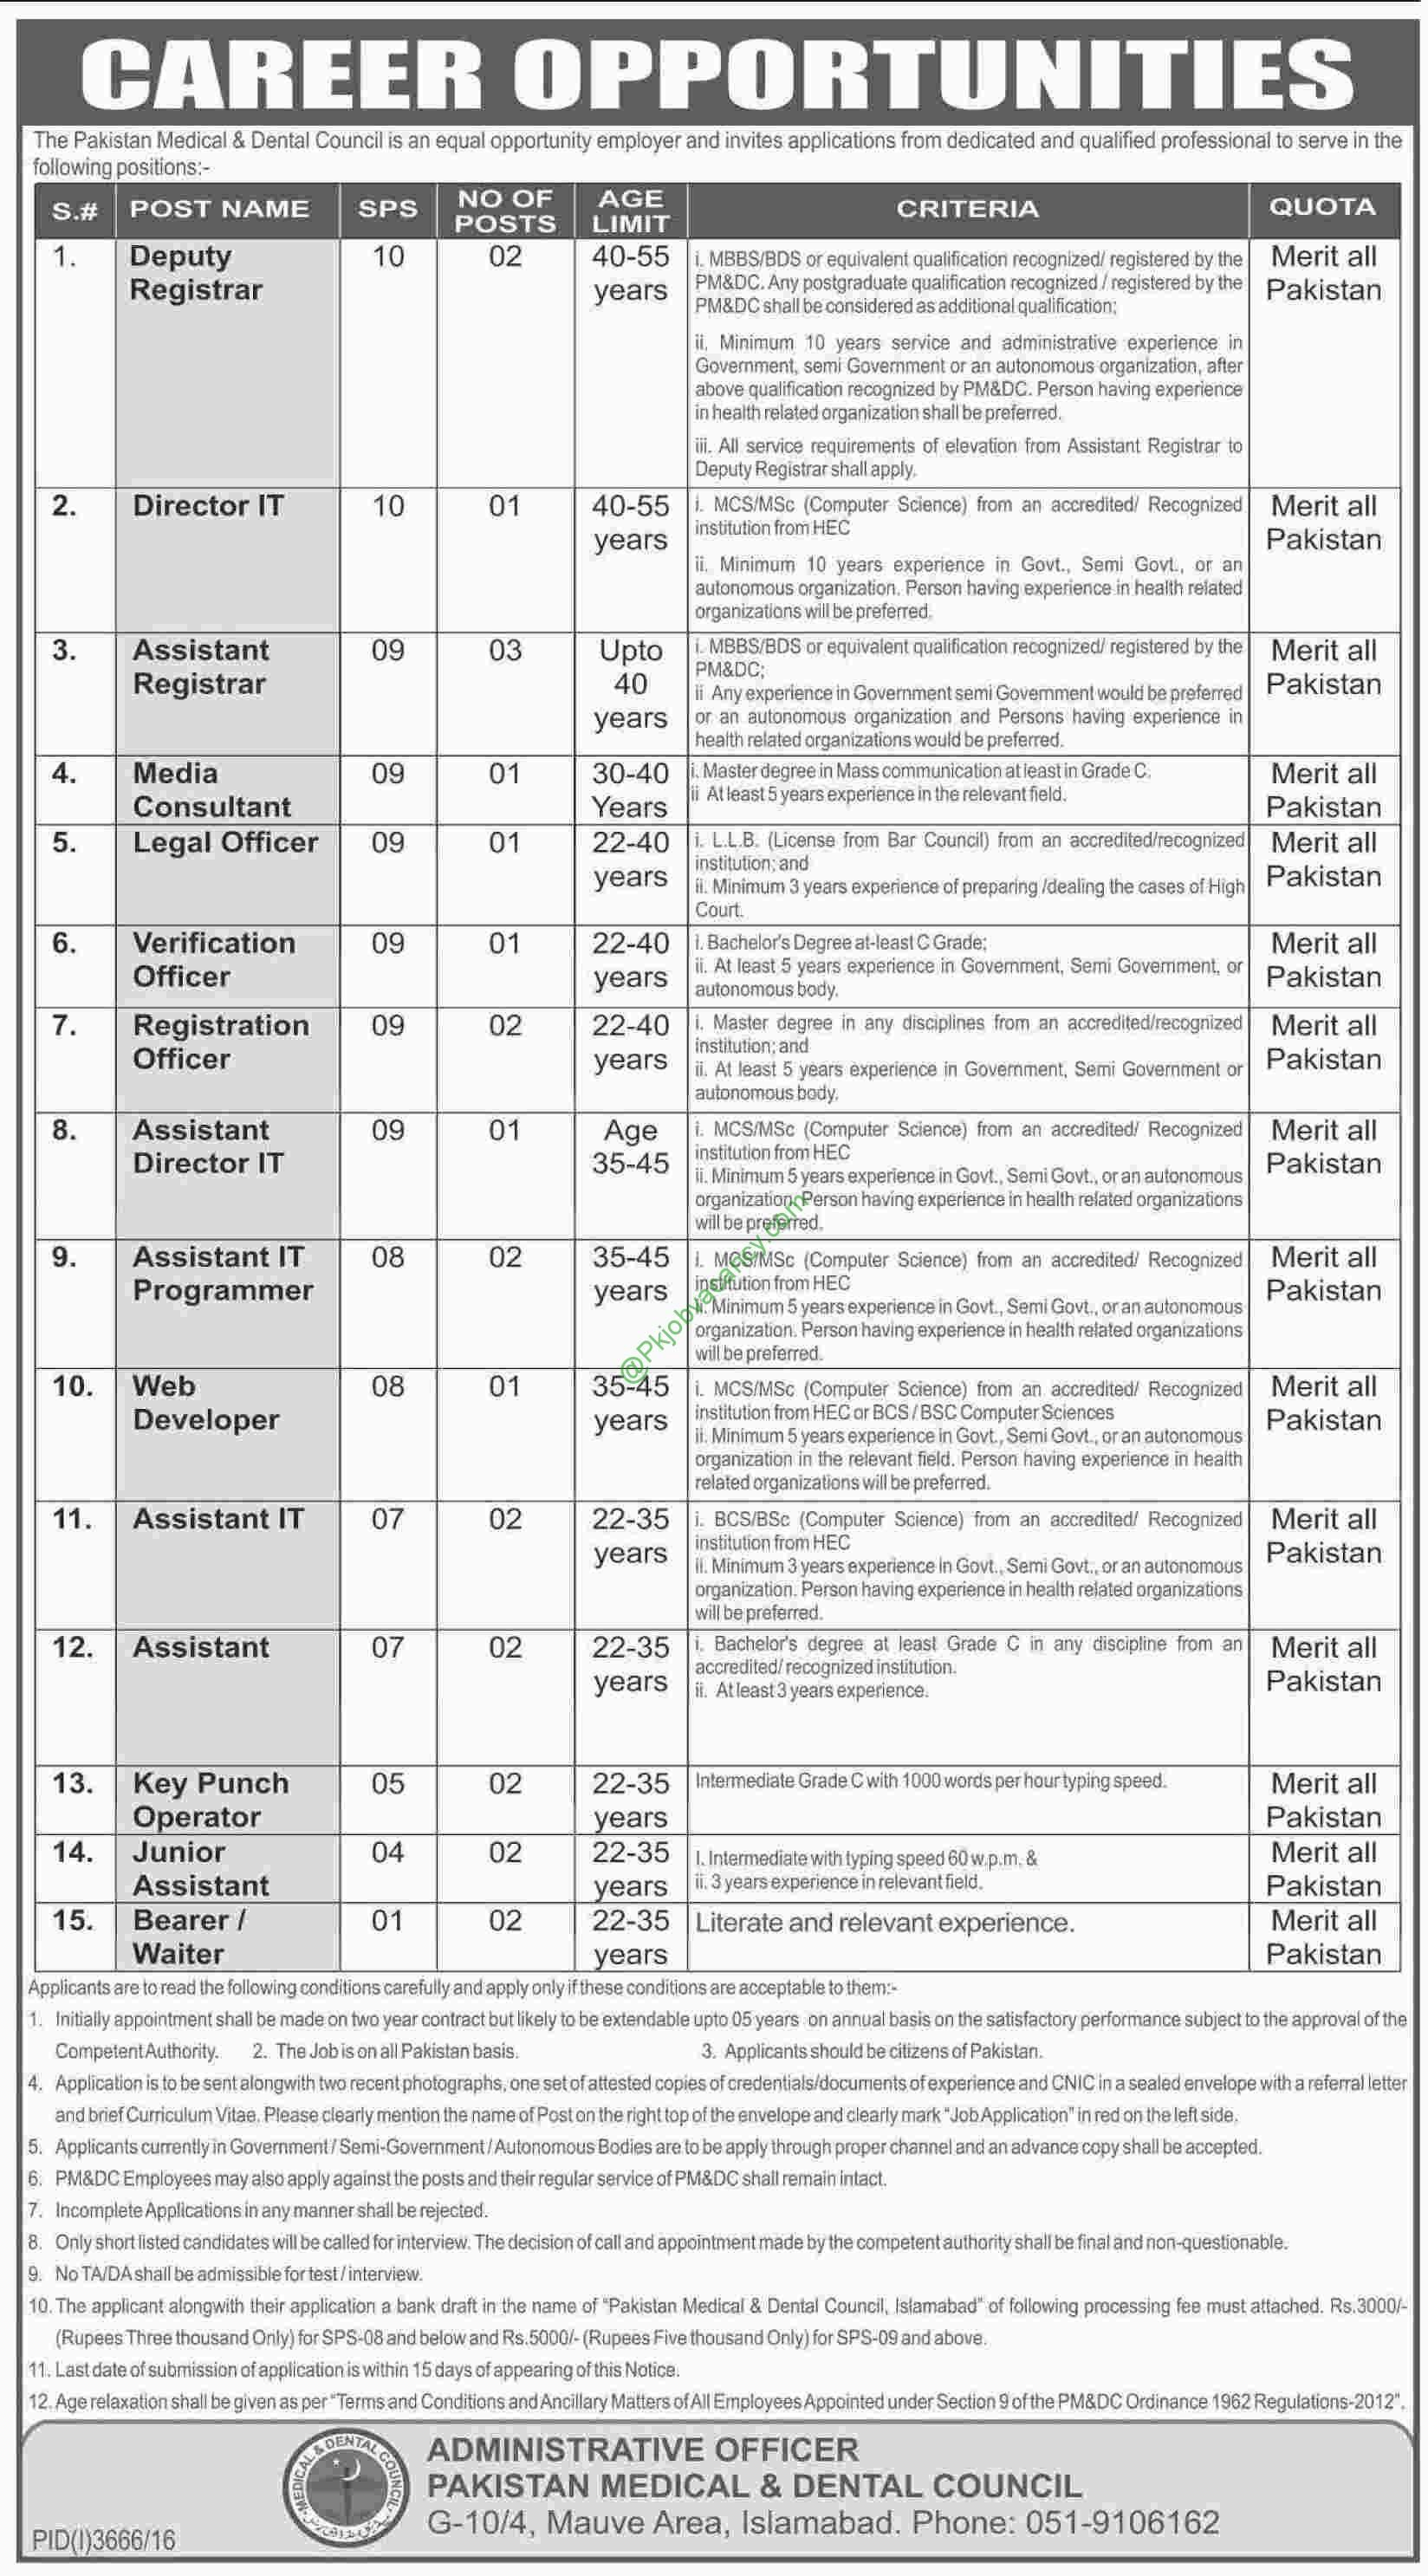 Pakistan Medical & Dental Council PMDC Jobs 2017 Latest